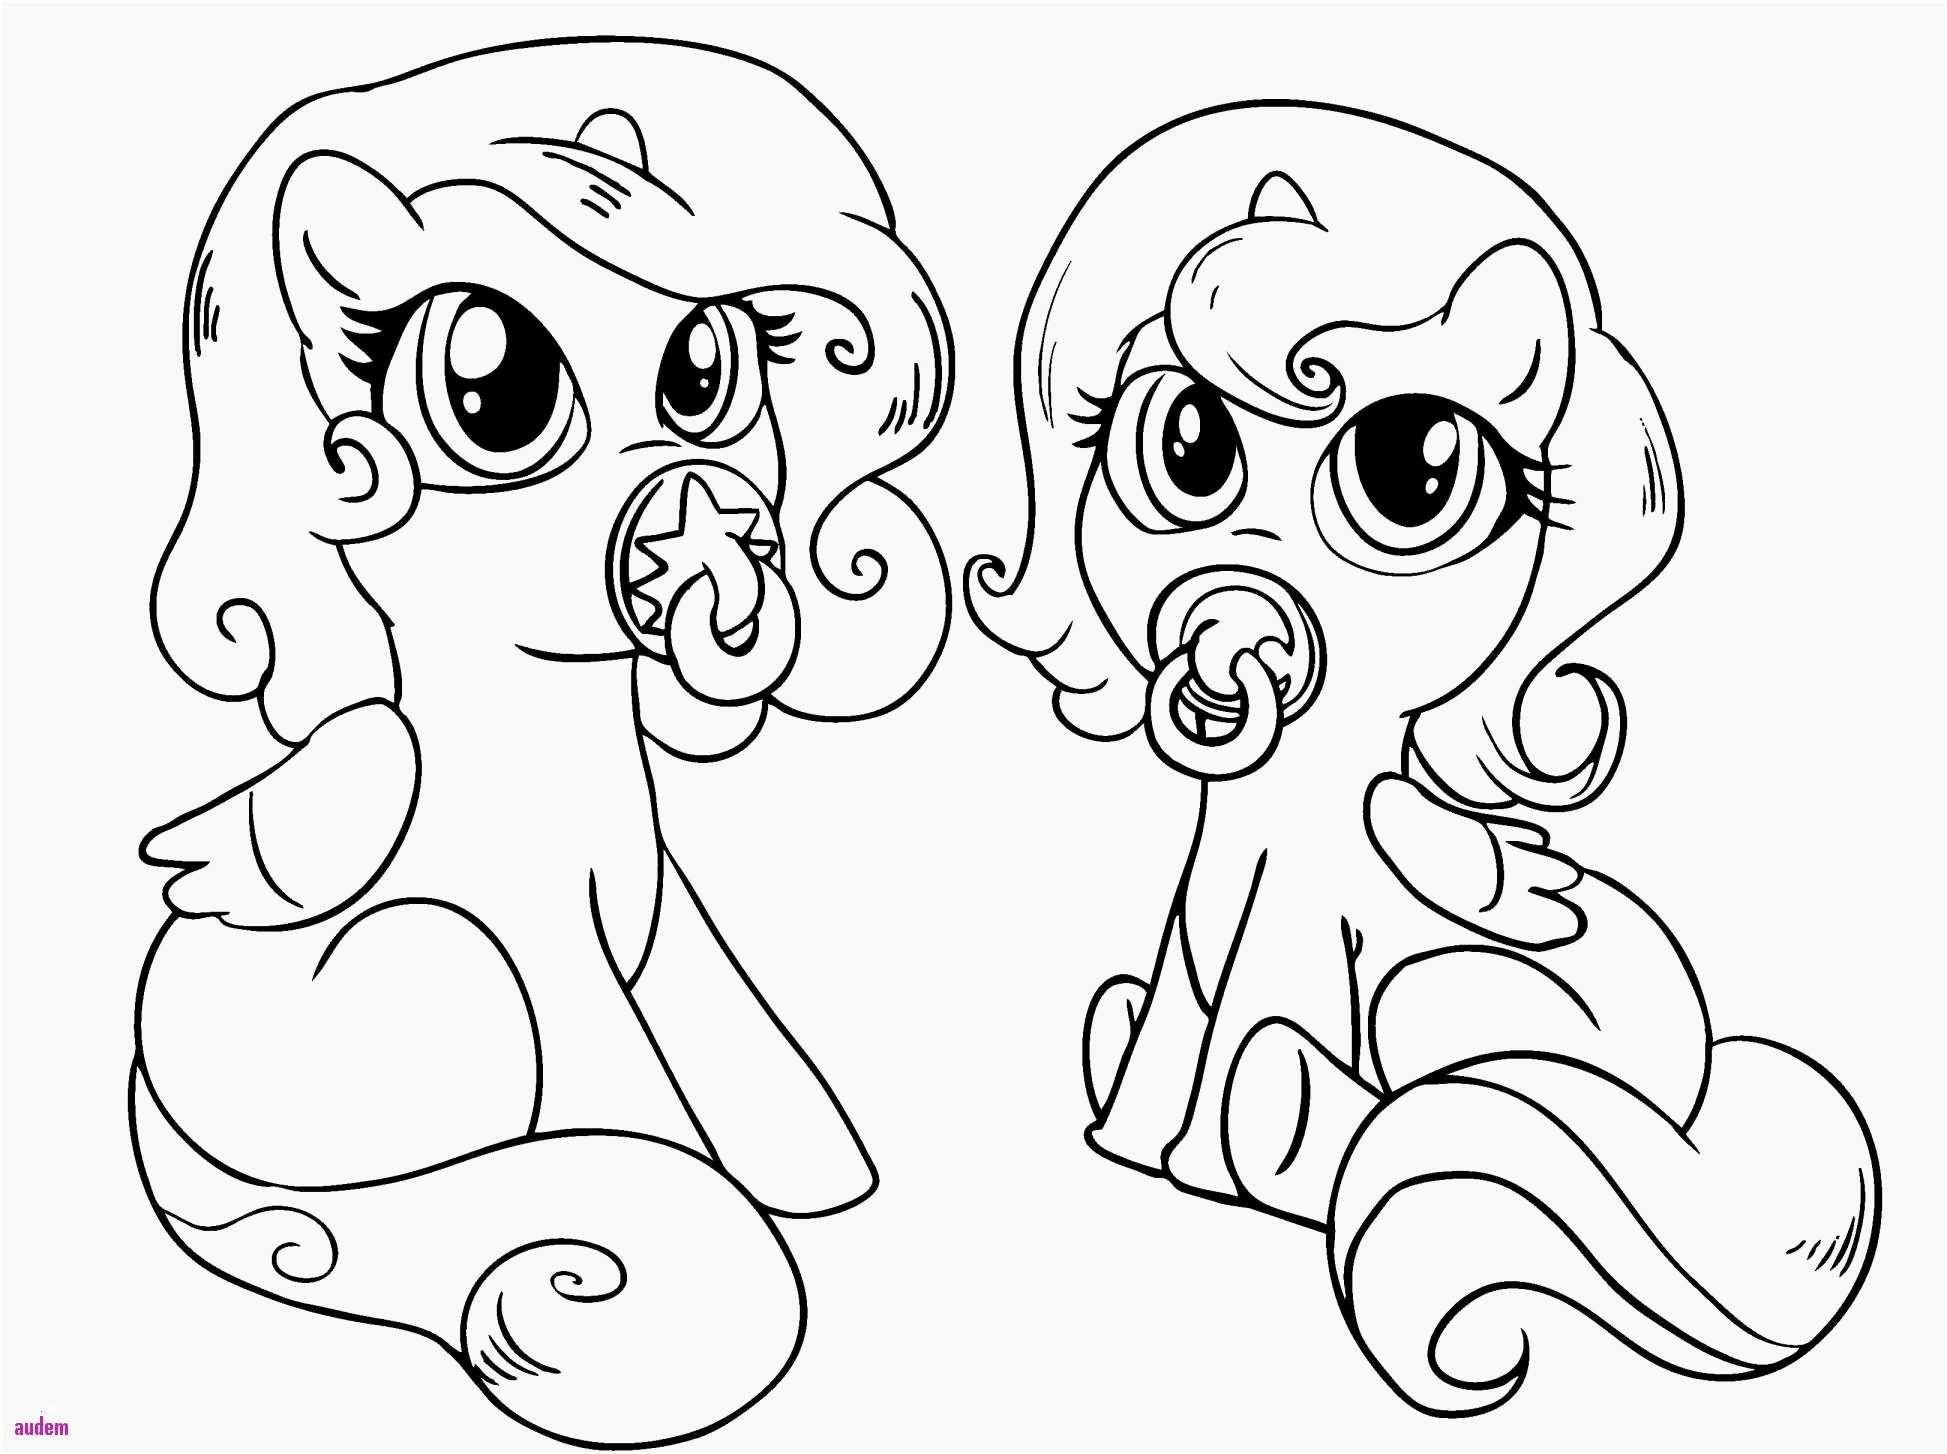 My Little Pony Friendship is Magic Ausmalbilder Neu 40 My Little Pony Friendship is Magic Ausmalbilder Scoredatscore Bild